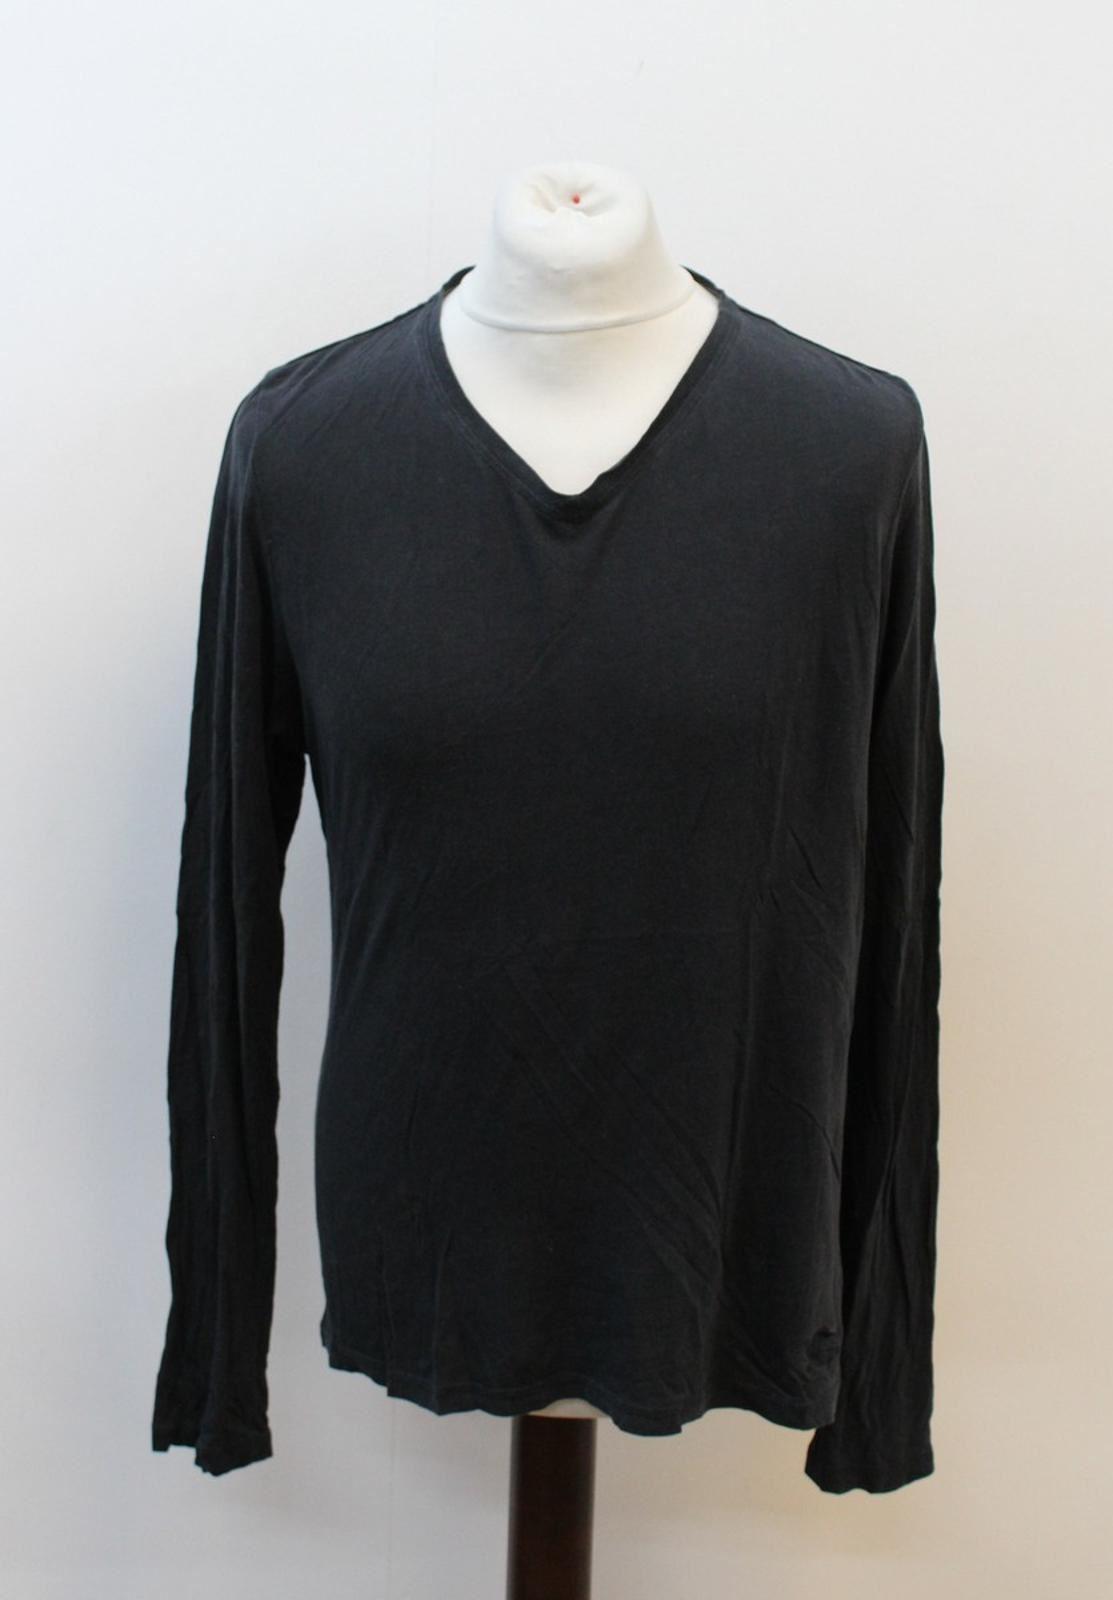 BURBERRY-LONDON-Men-039-s-Black-Long-Sleeve-V-Neckline-Basic-T-Shirt-Size-XL